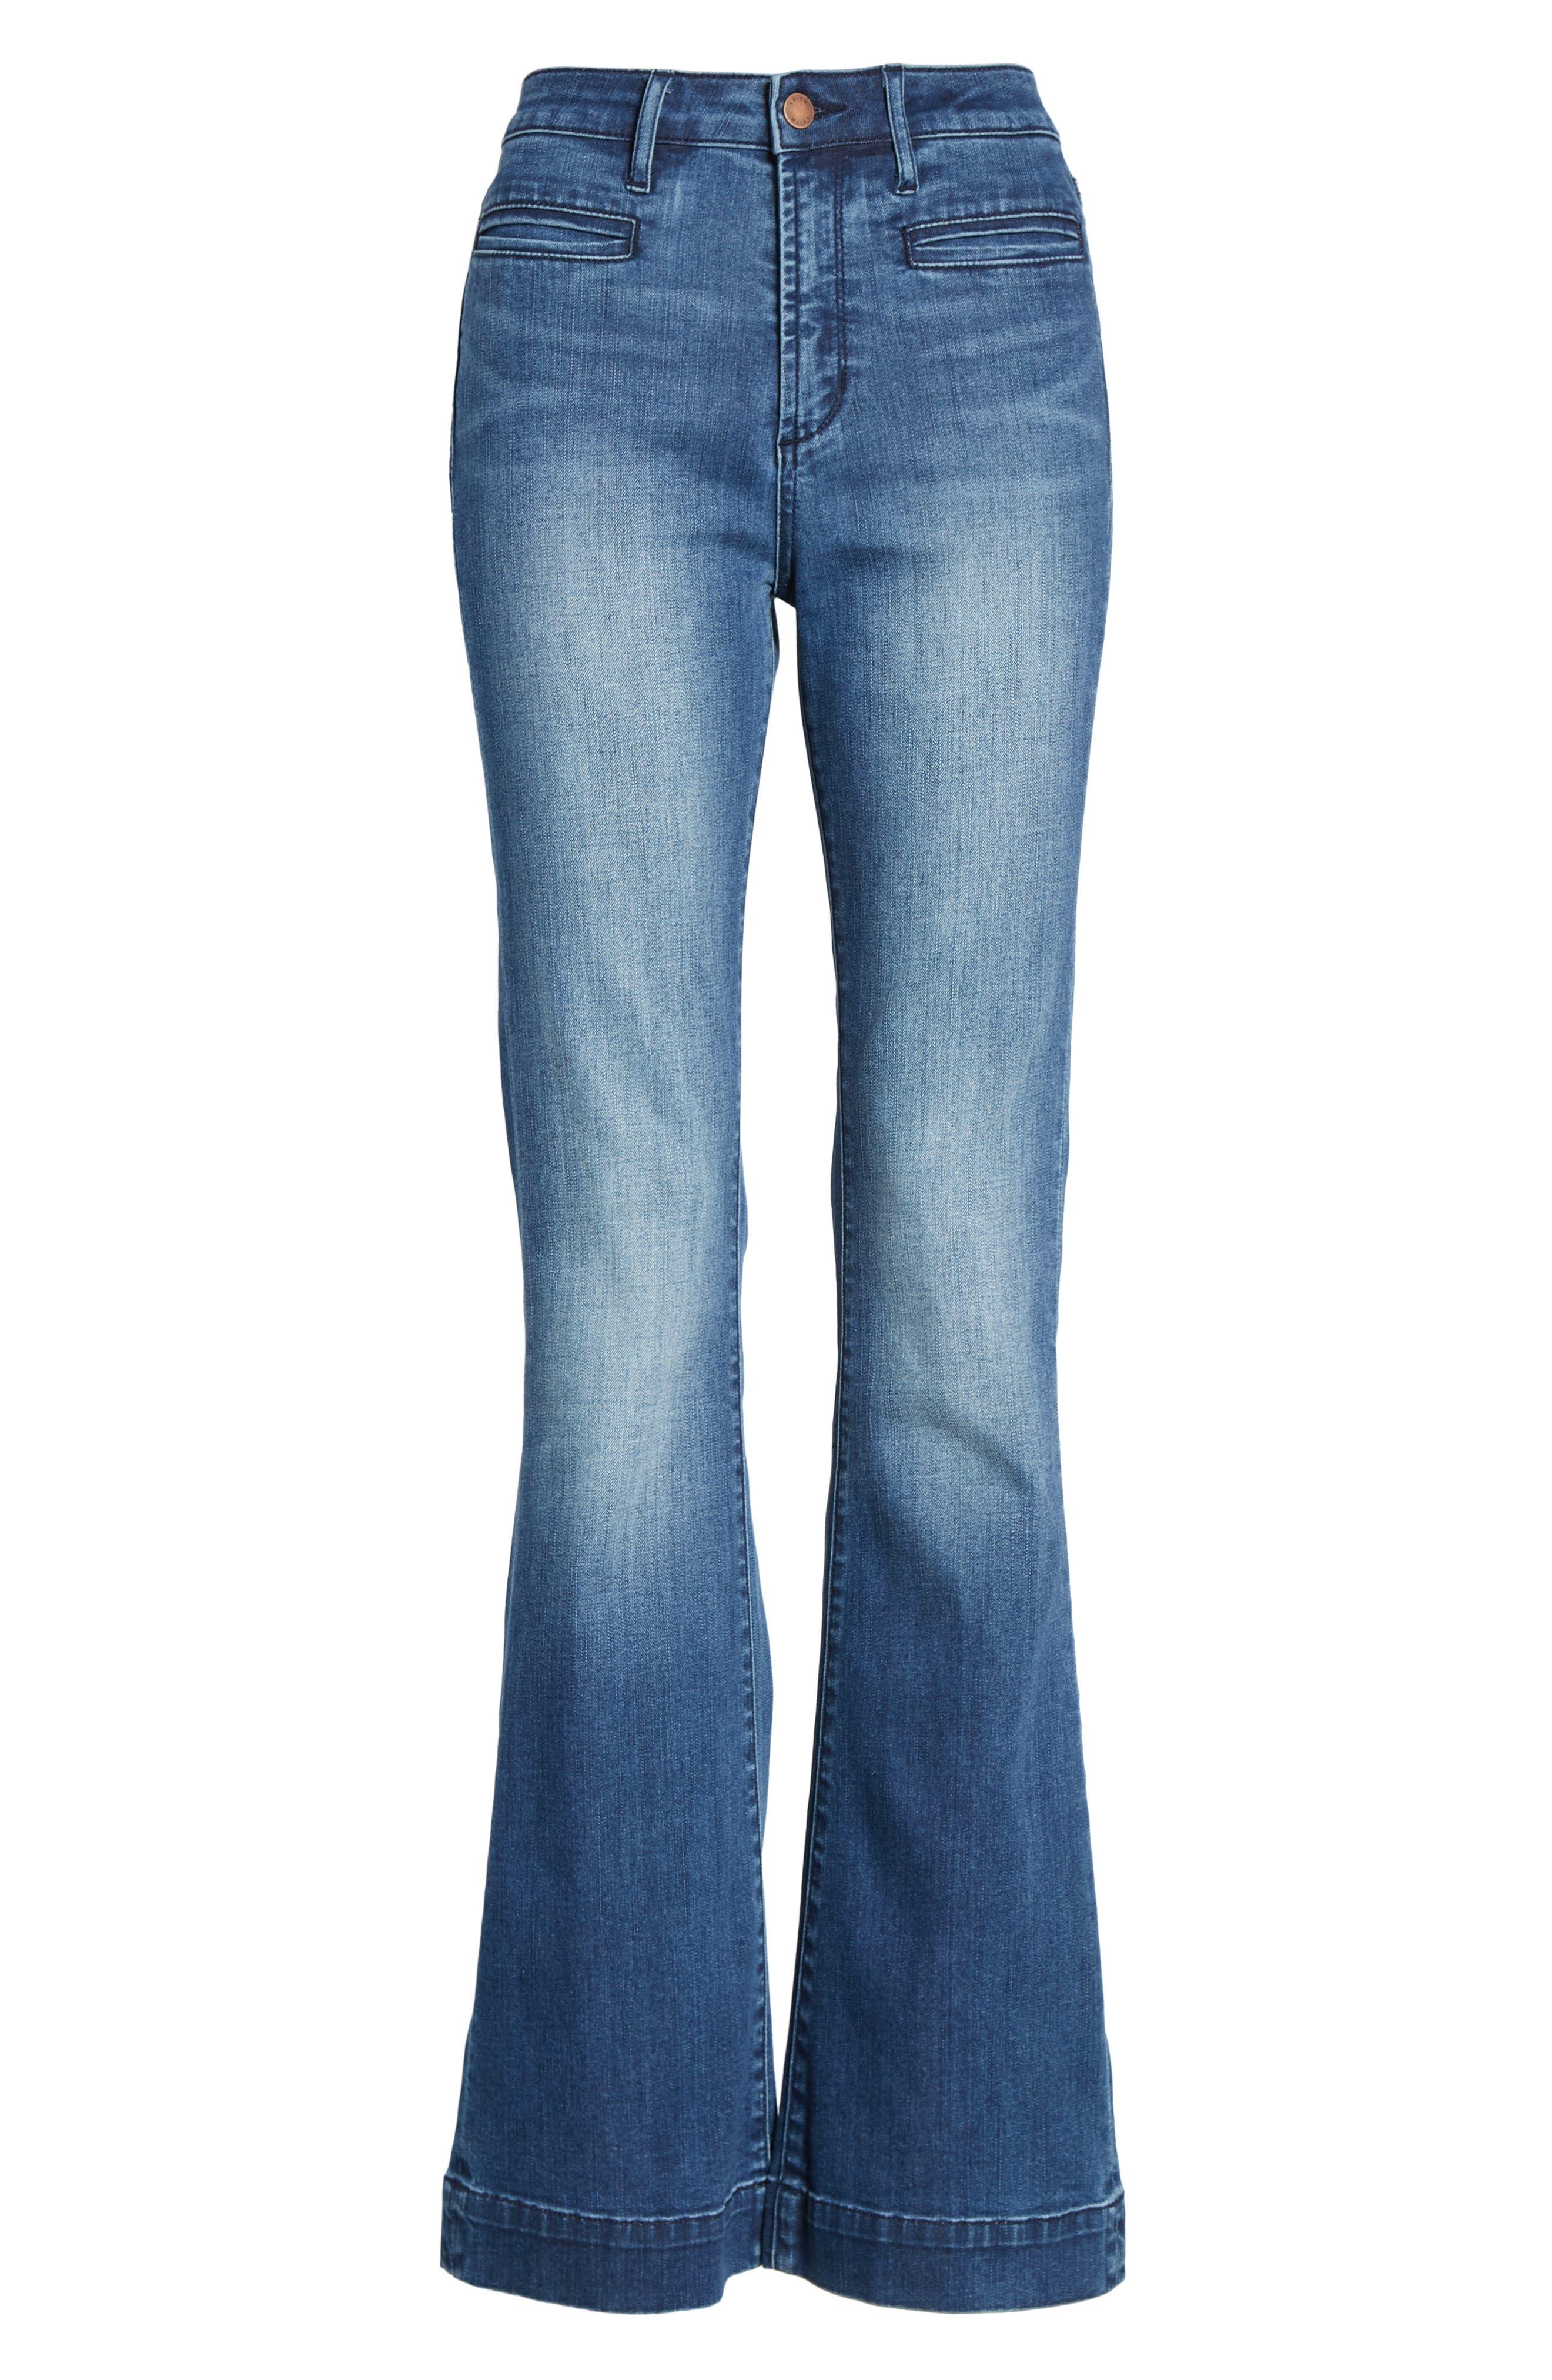 LEITH, High Waist Flare Jeans, Alternate thumbnail 7, color, MEDIUM WASH